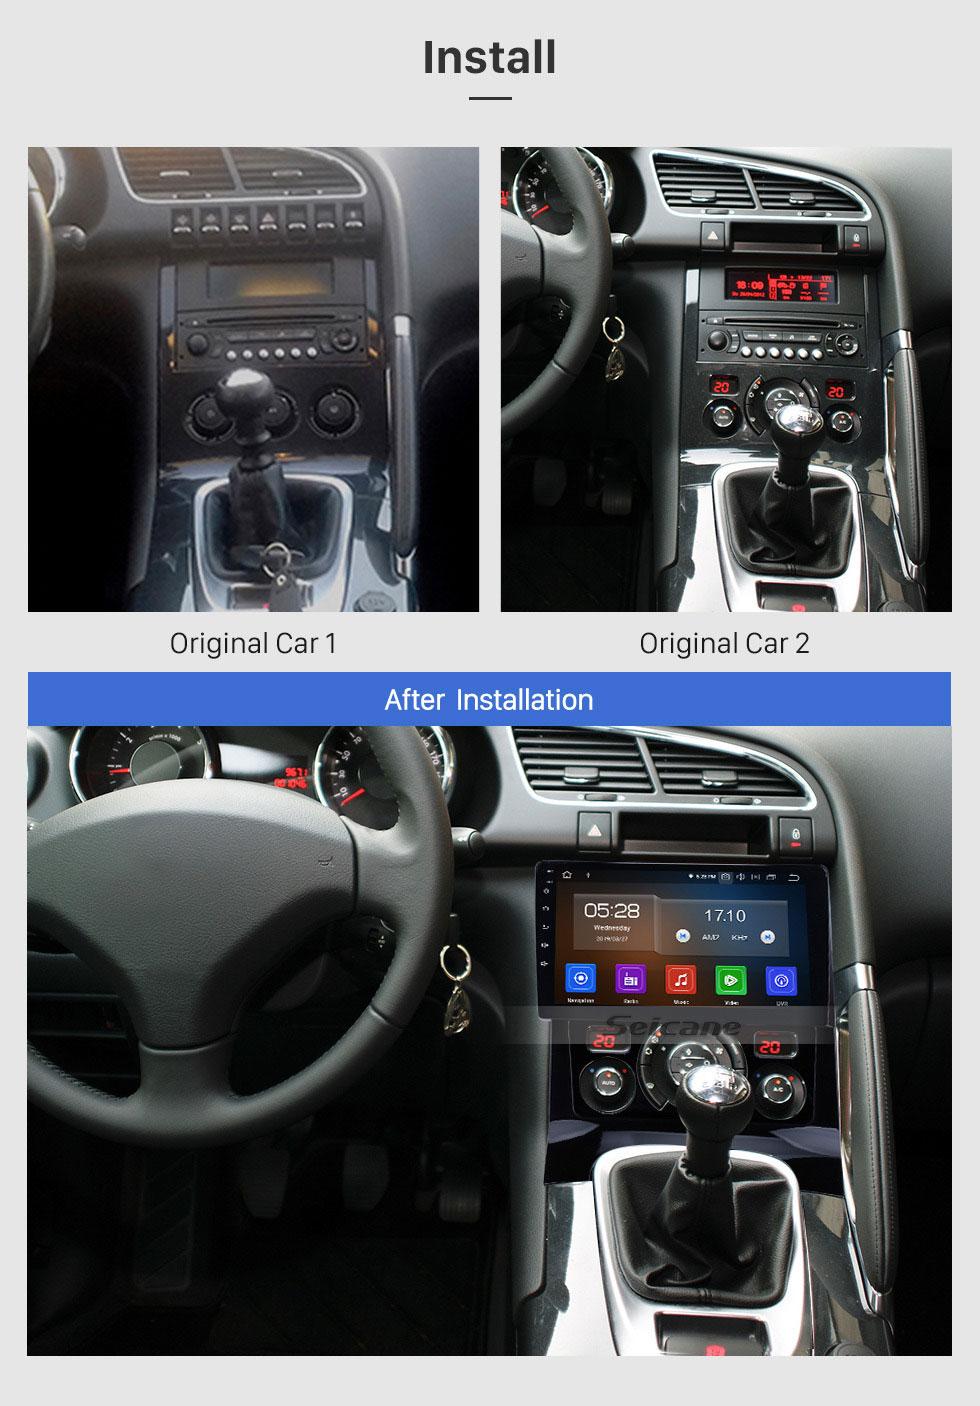 Seicane 2009-2012 Peugeot 3008  9 Zoll Android 9.0 1024 * 600 Touchscreen Radio GPS Sat Nav mit Bluetooth 4G WIFI OBD2 Rückfahrkamera Lenkradsteuerung